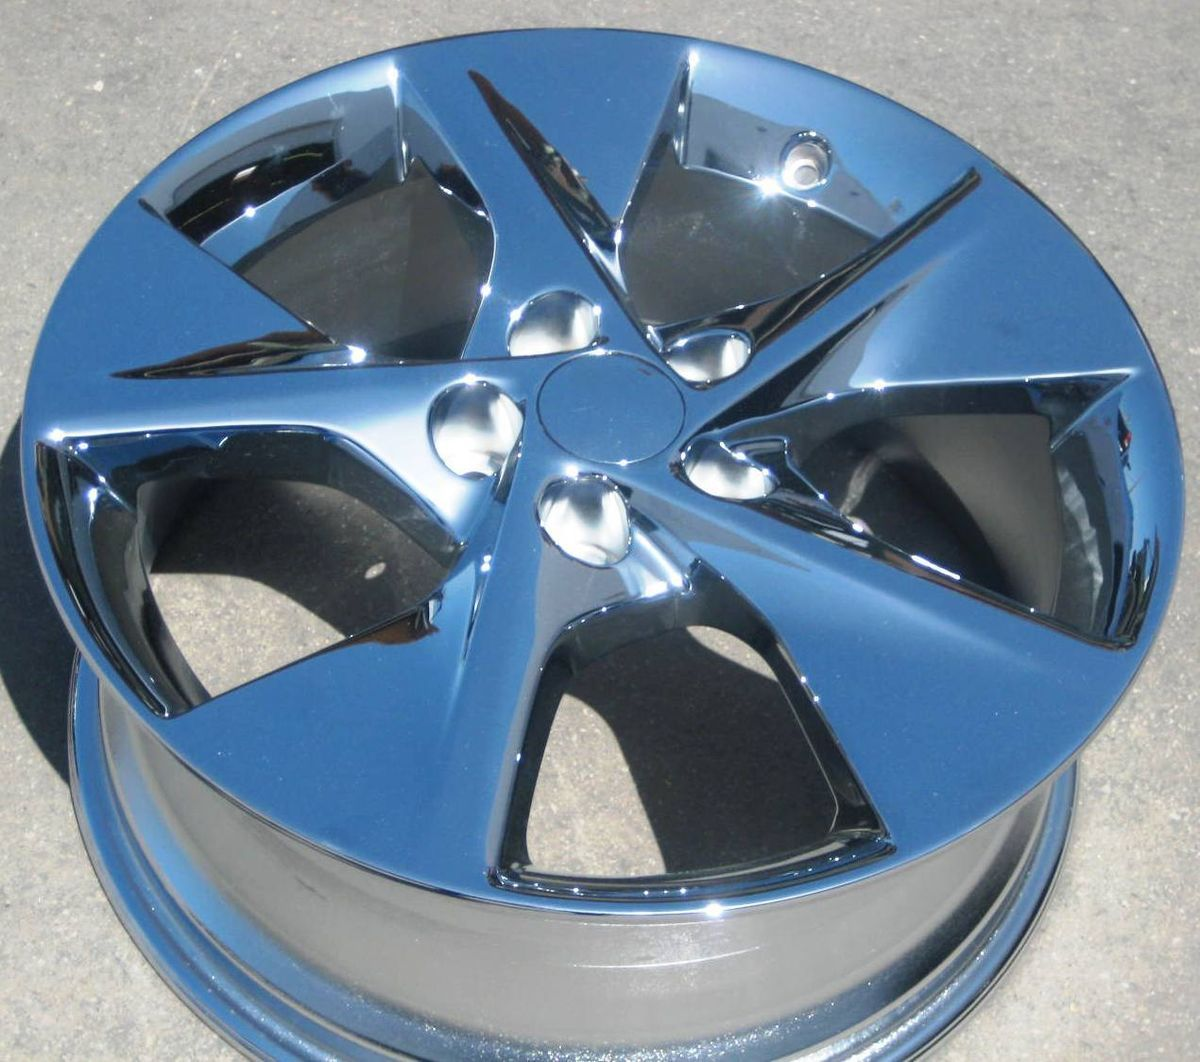 New 2012 13 18 Factory Toyota Camry Chrome Wheels Rims gs350 GS430